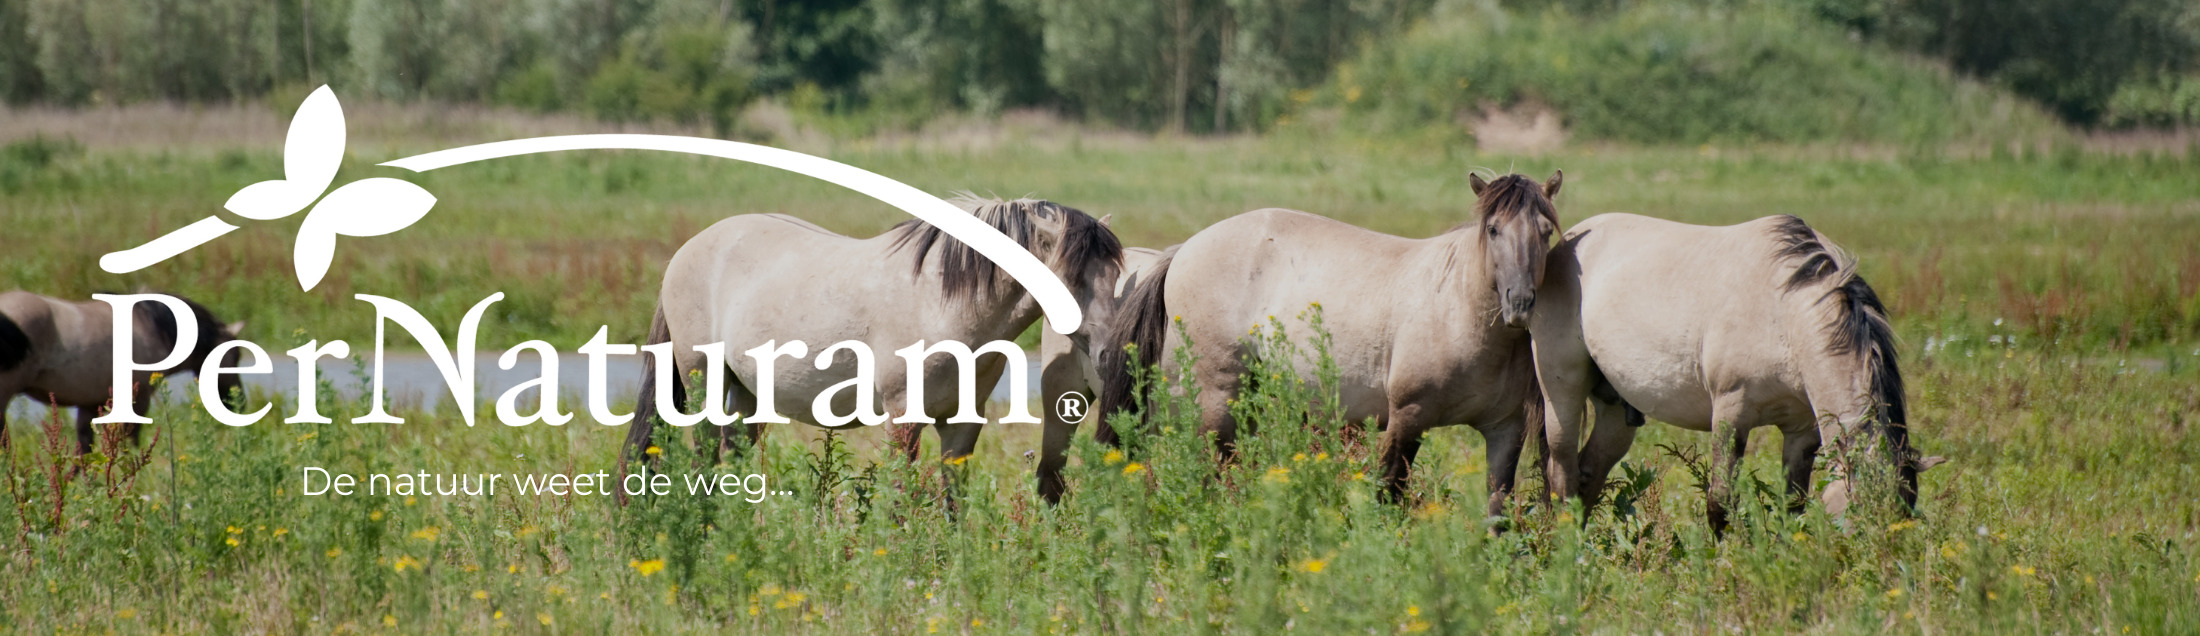 Per Naturam Paardenvoeding